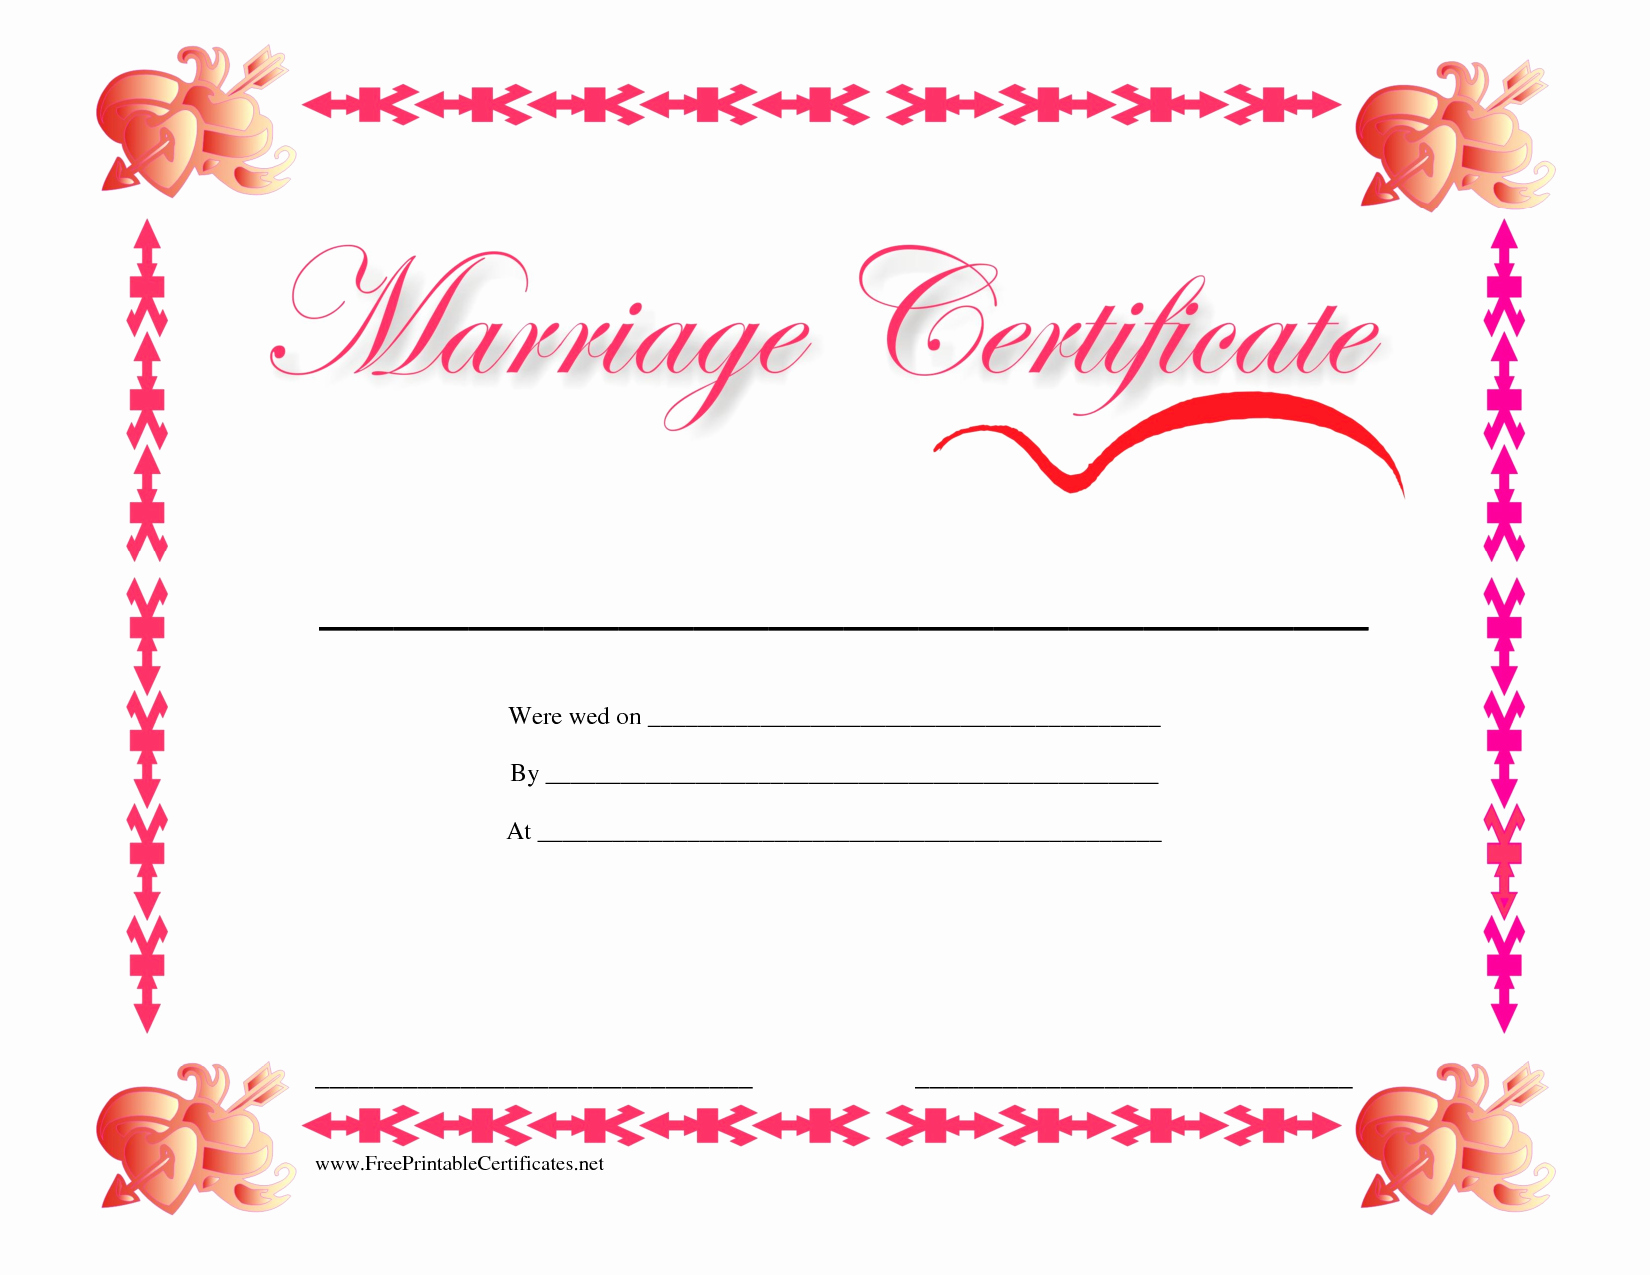 Islamic Marriage Certificate Template Fresh Certificate Template Category Page 28 Efoza